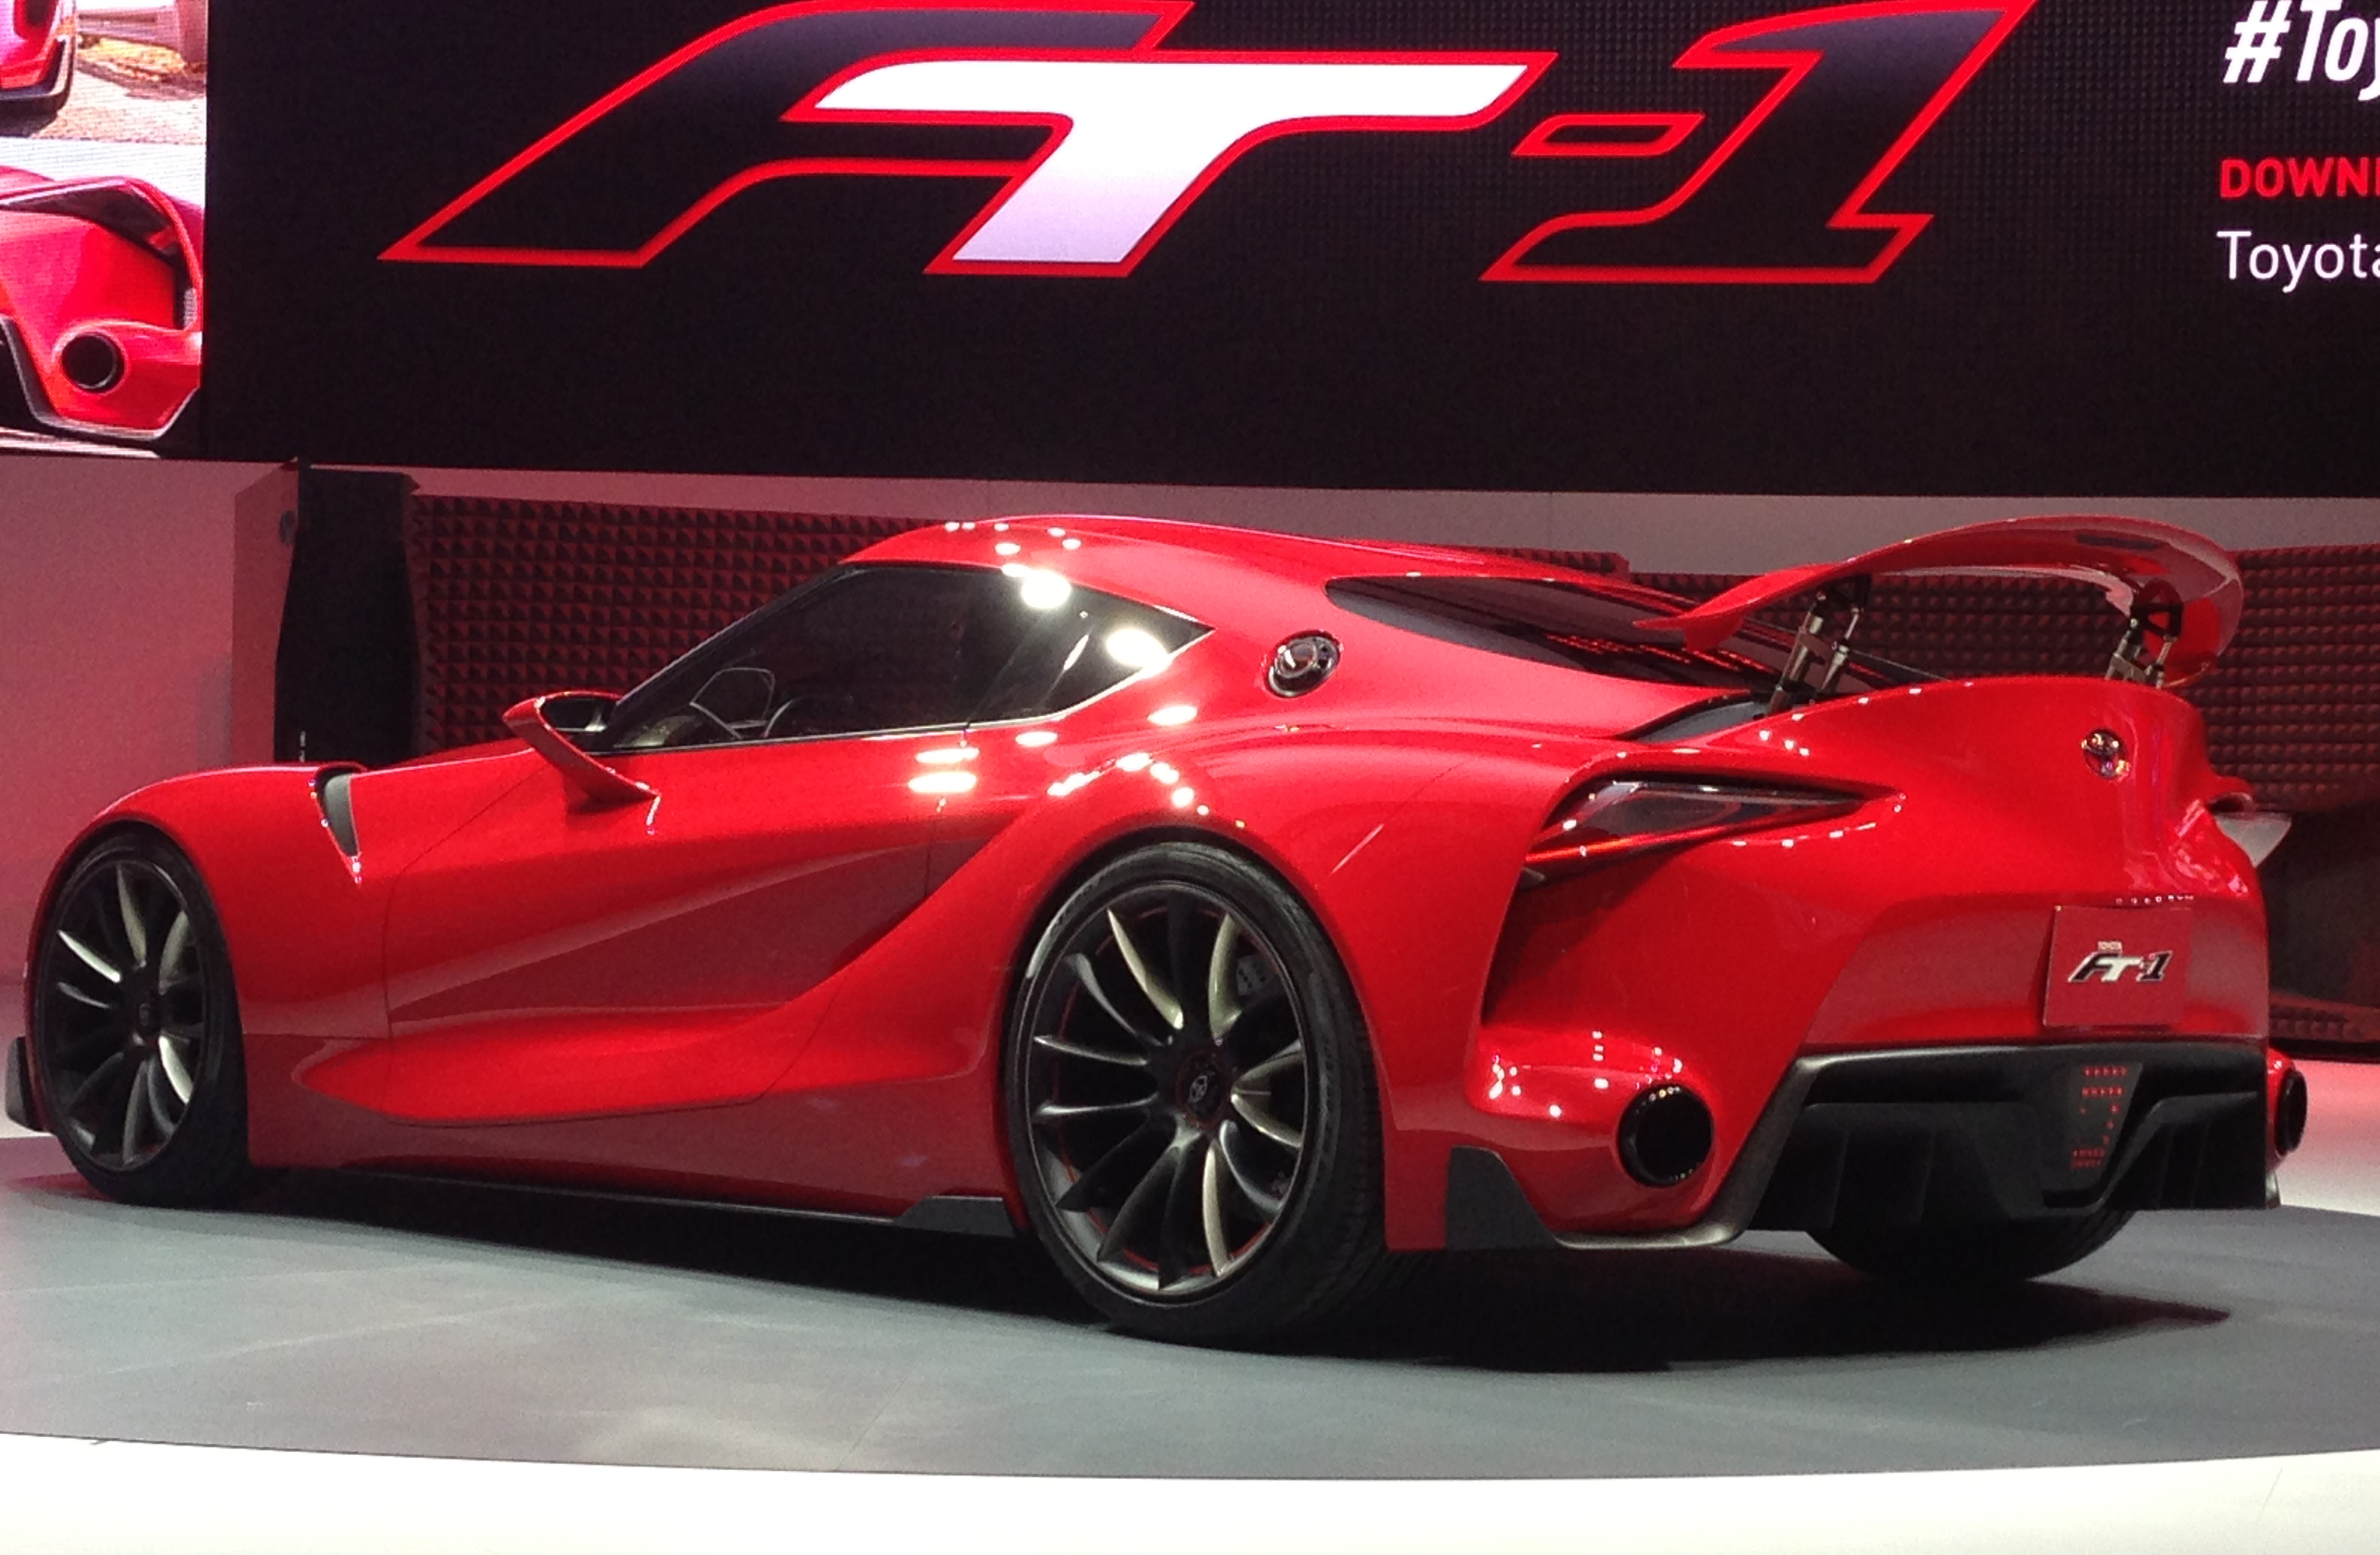 Toyota FT-1 concept shocks Detroit – the next Supra? Paul ...